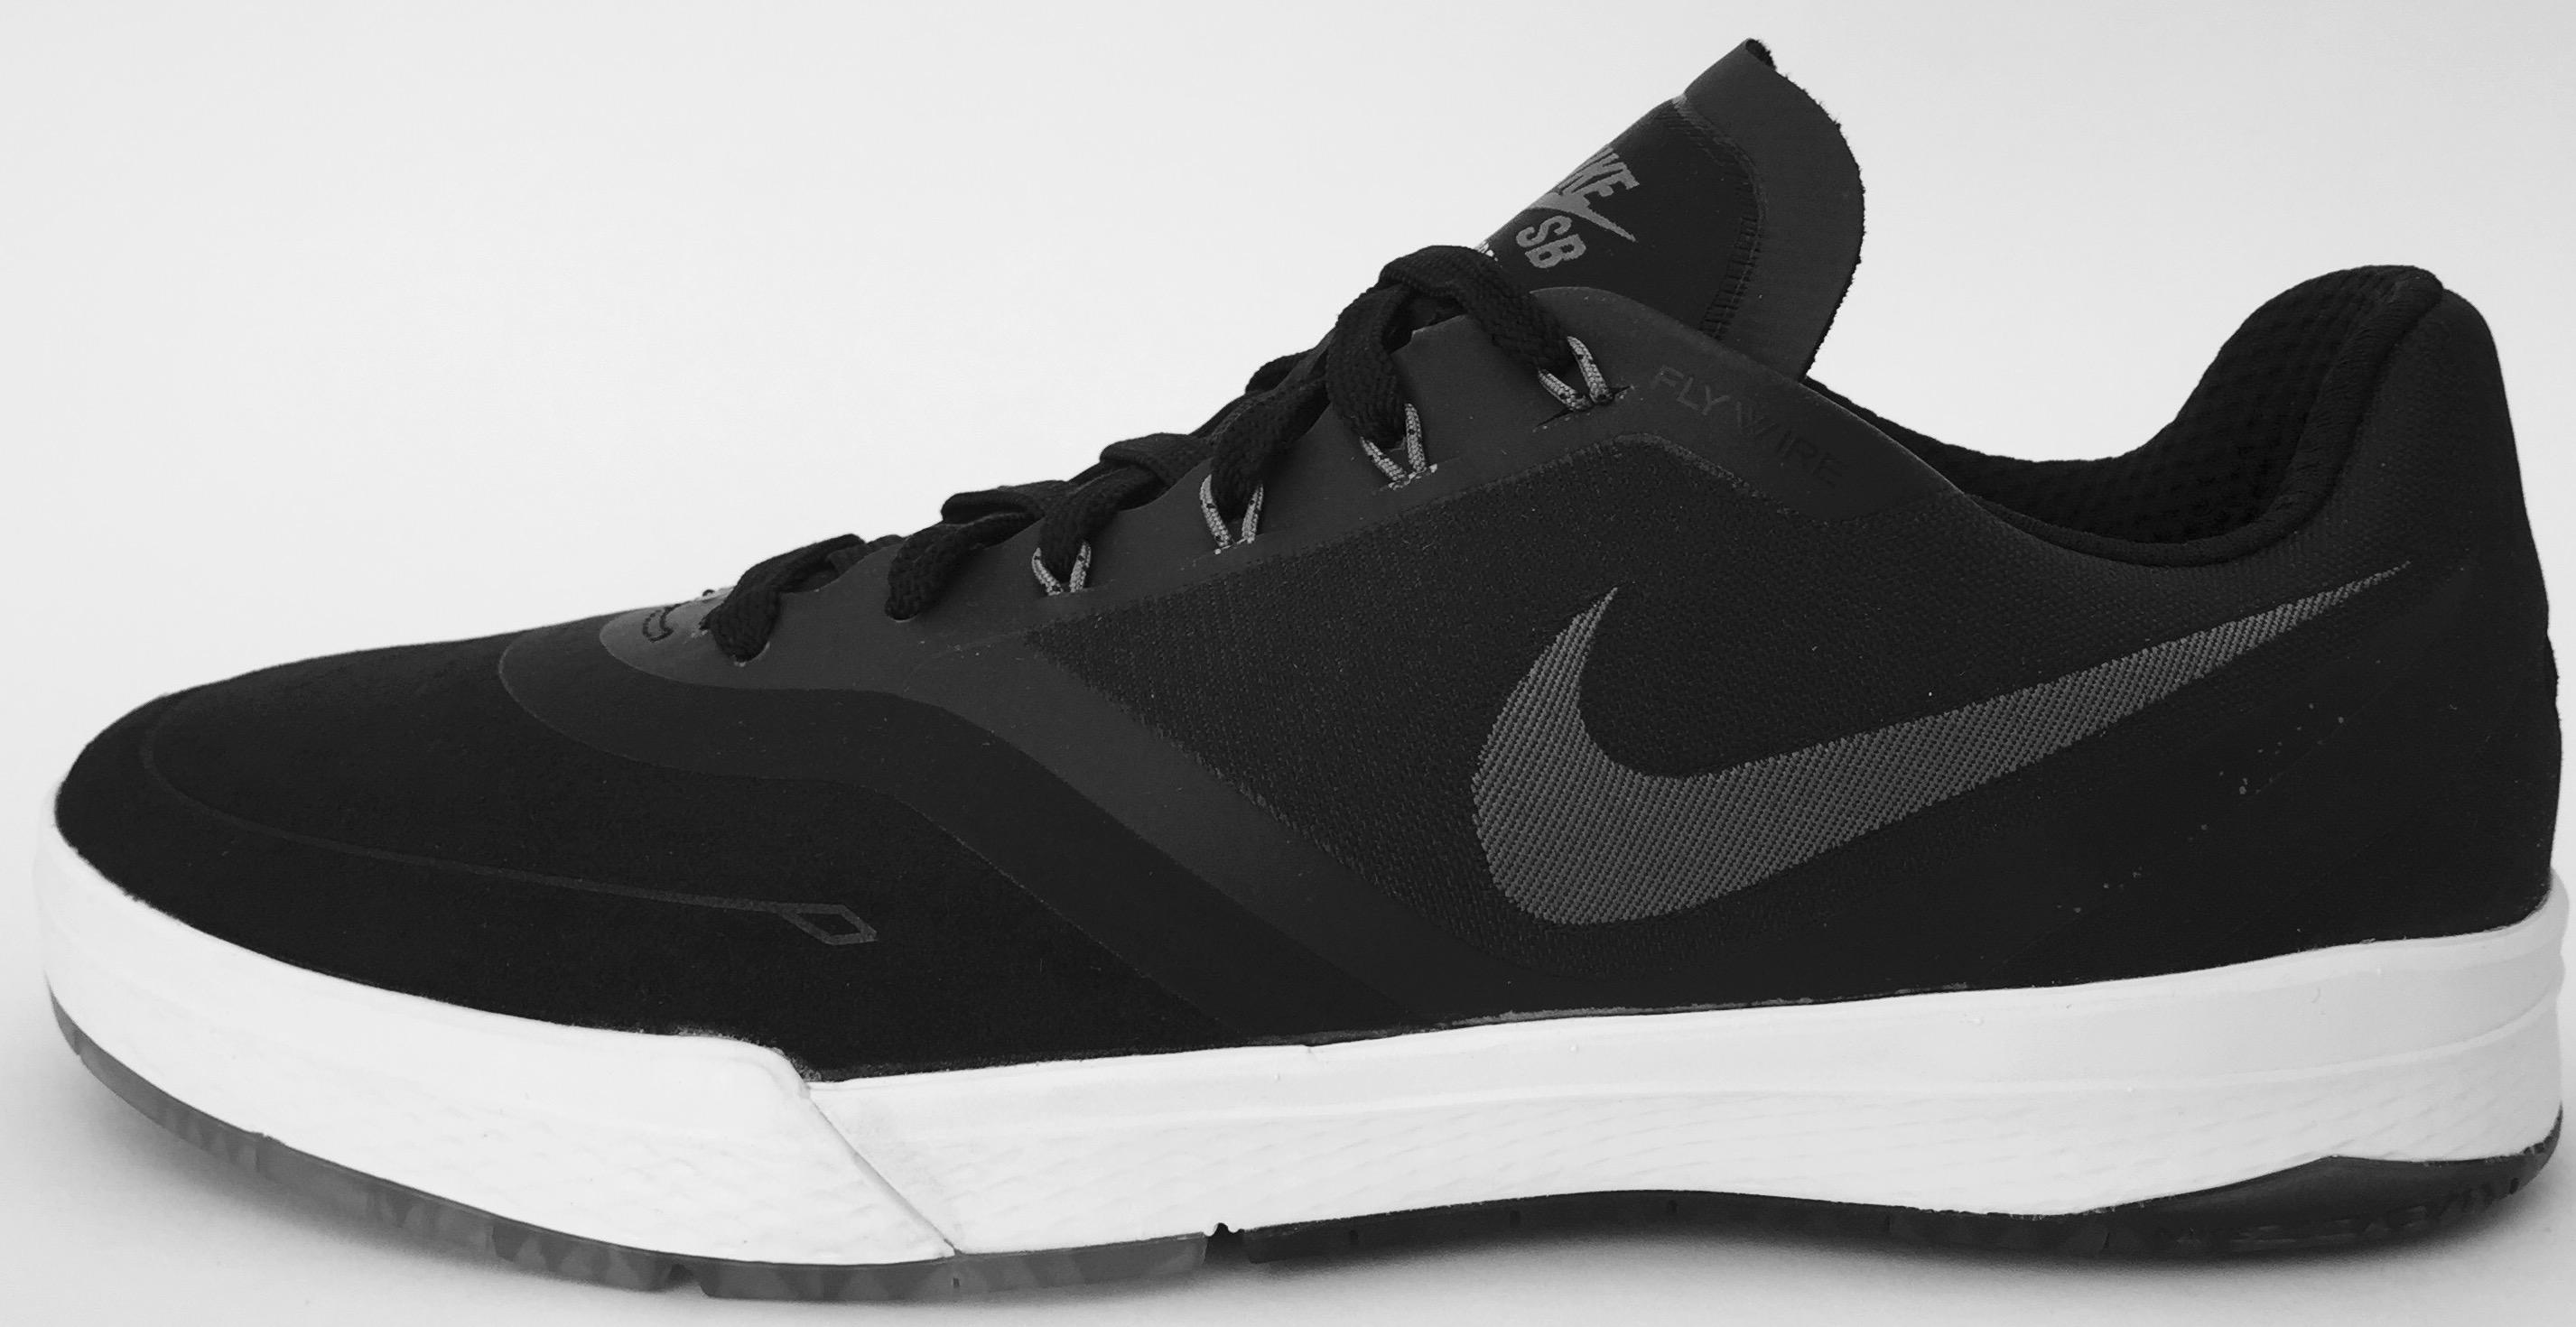 ff404b2fe7973c Nike SB Paul Rodriguez P-Rod 9 - Weartested - detailed skate shoe ...